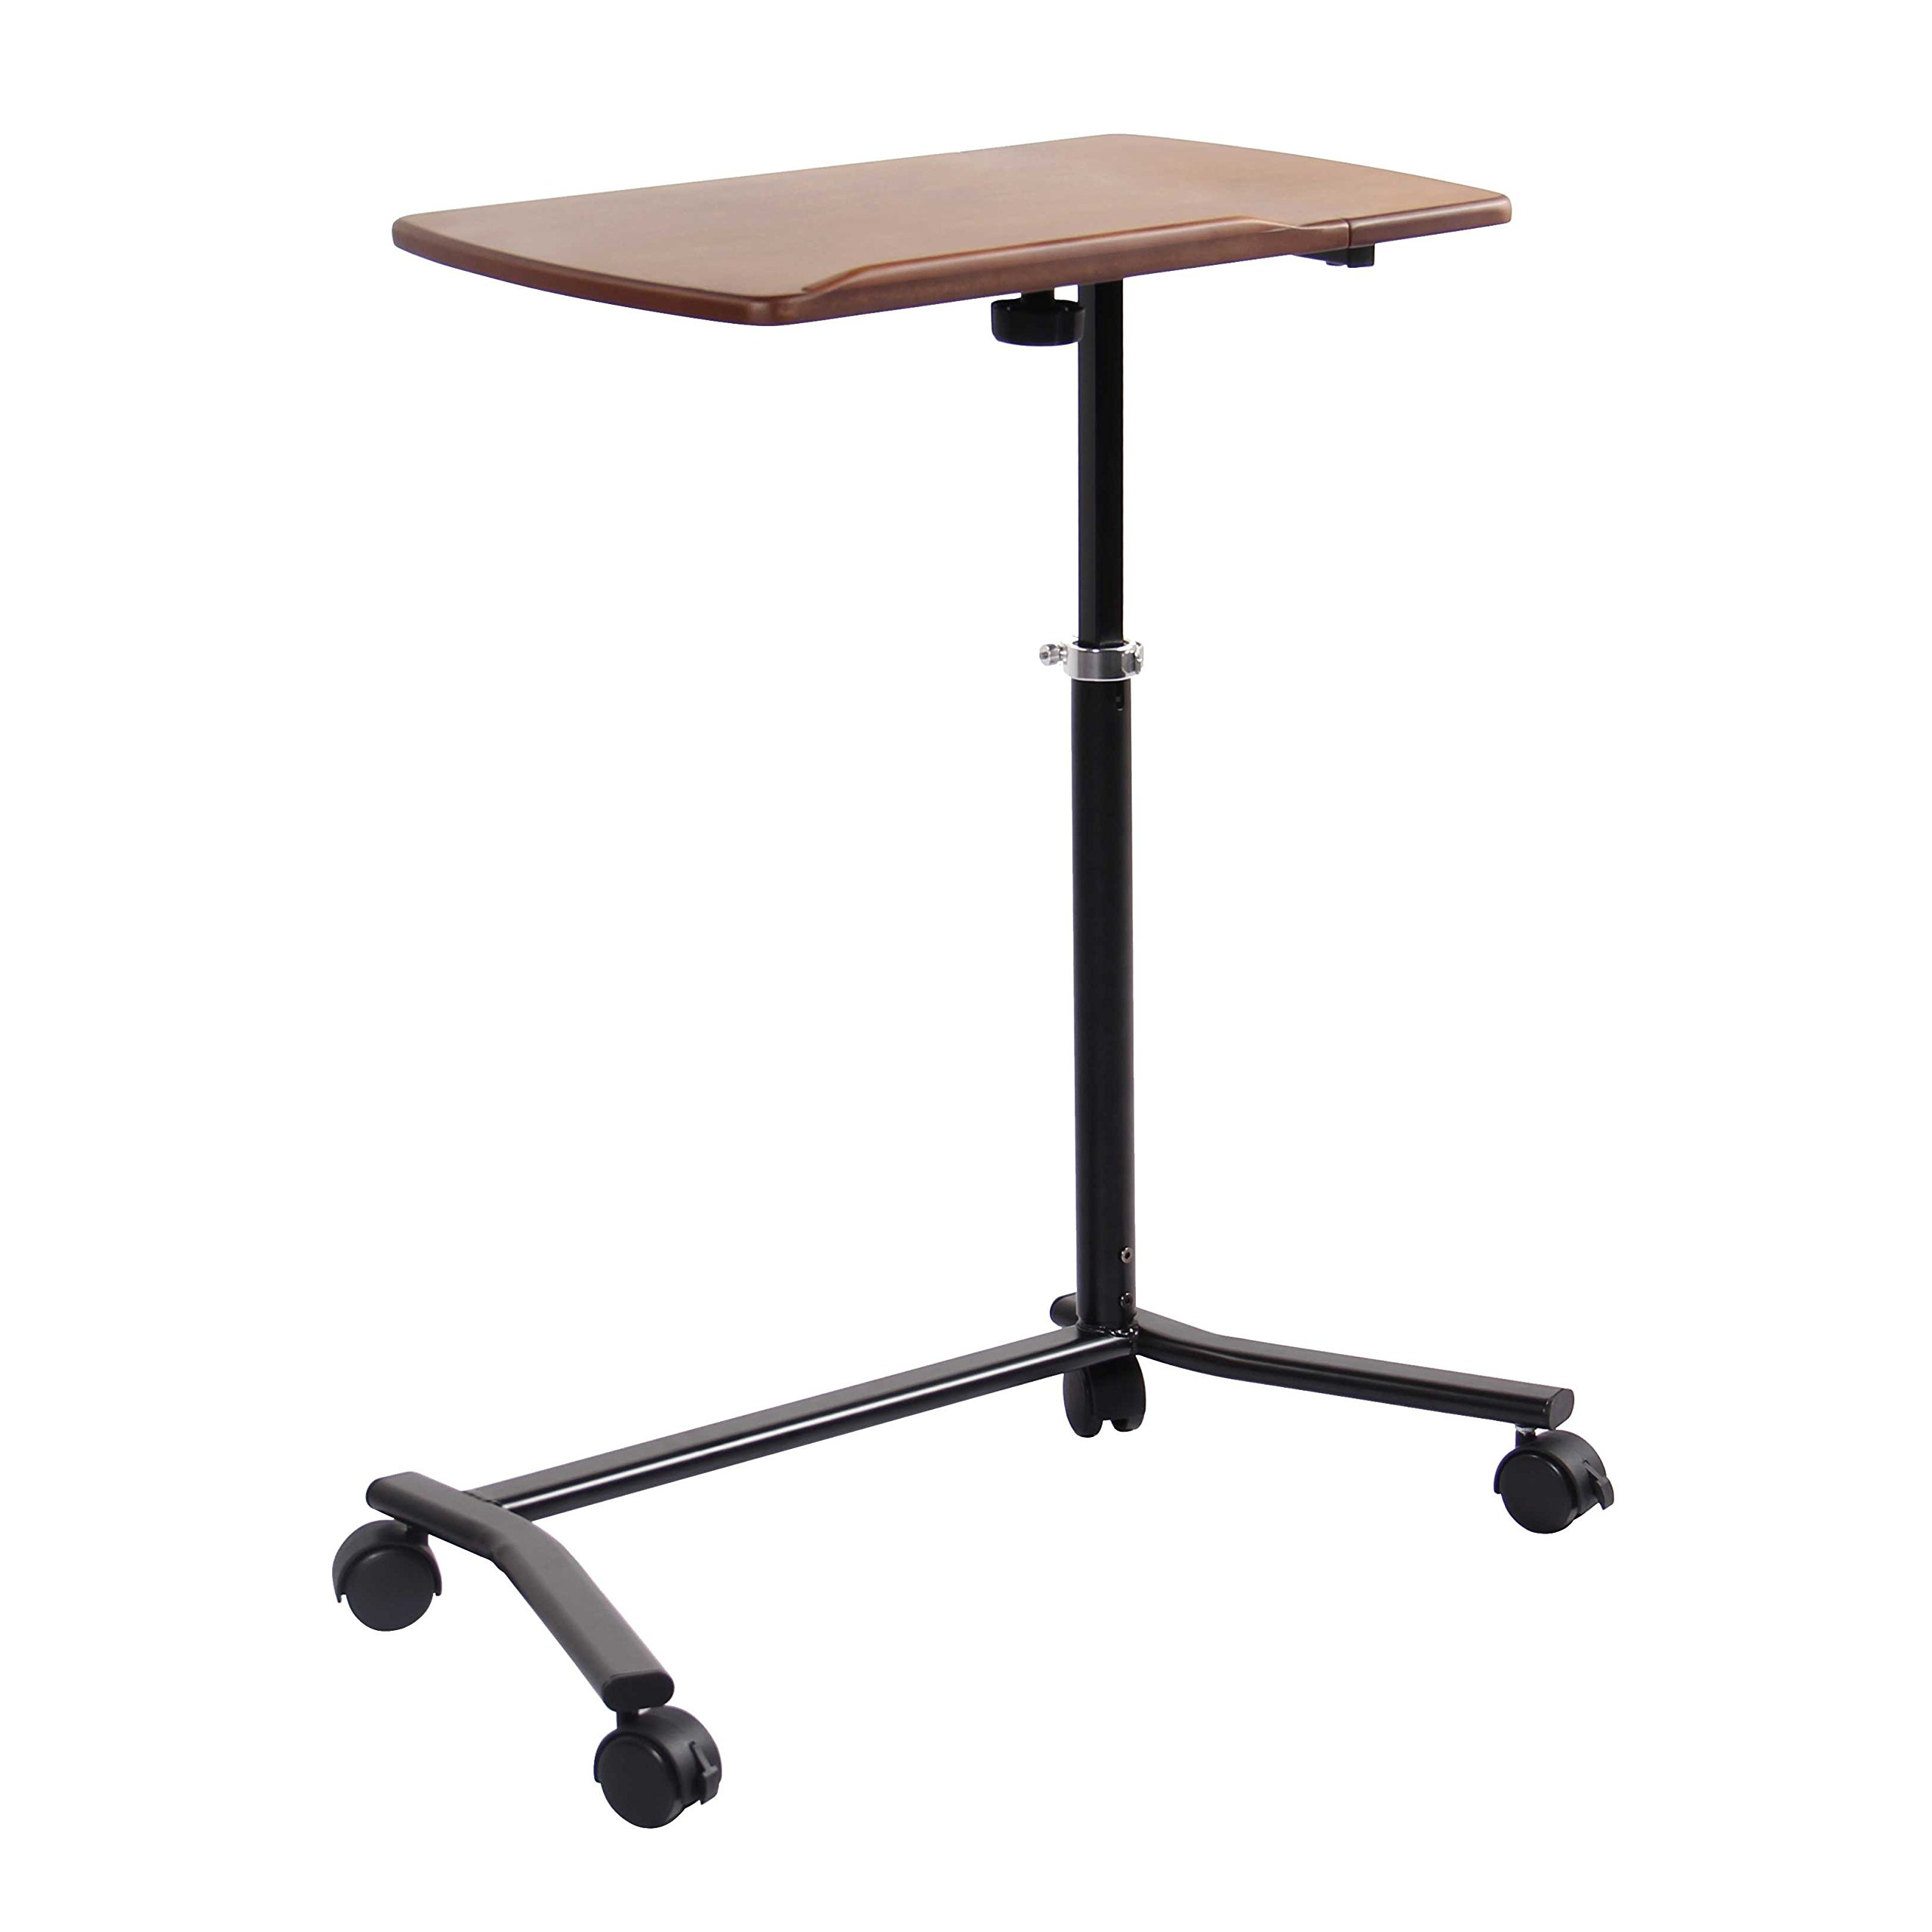 HomeRoots Furniture Laptop Table - Chestnut